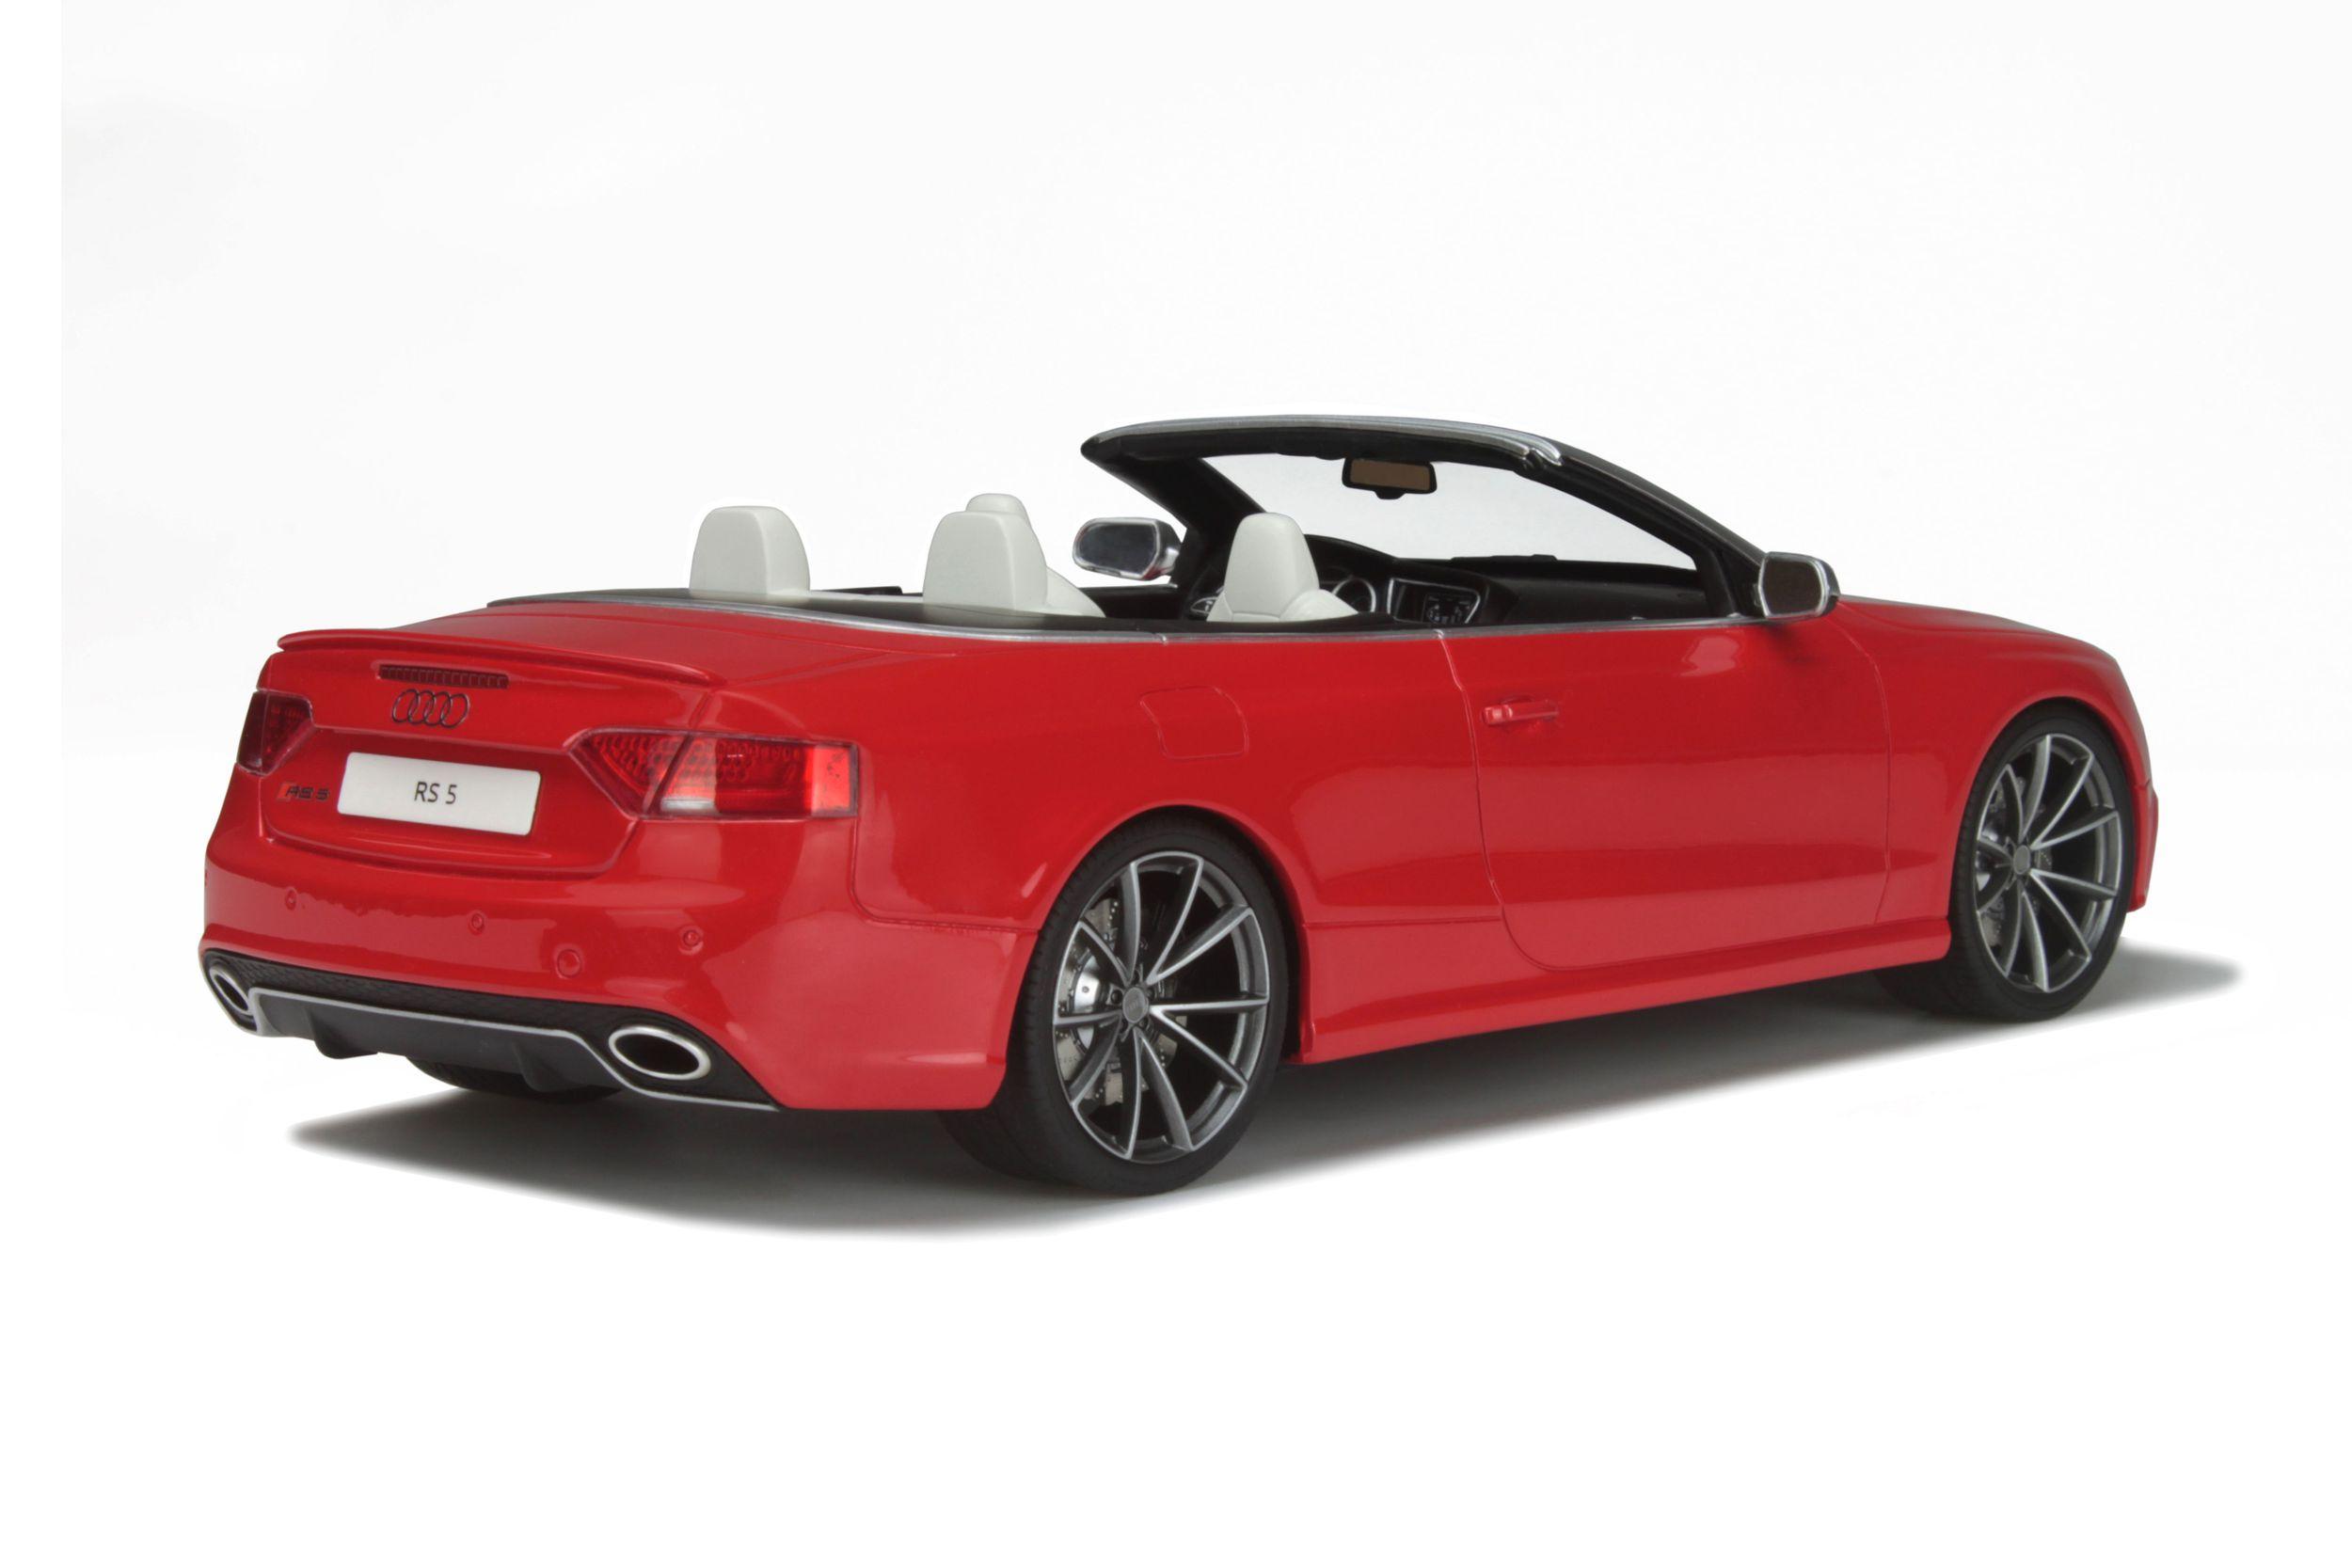 Audi Rs 5 Convertible Model Car Collection Gt Spirit